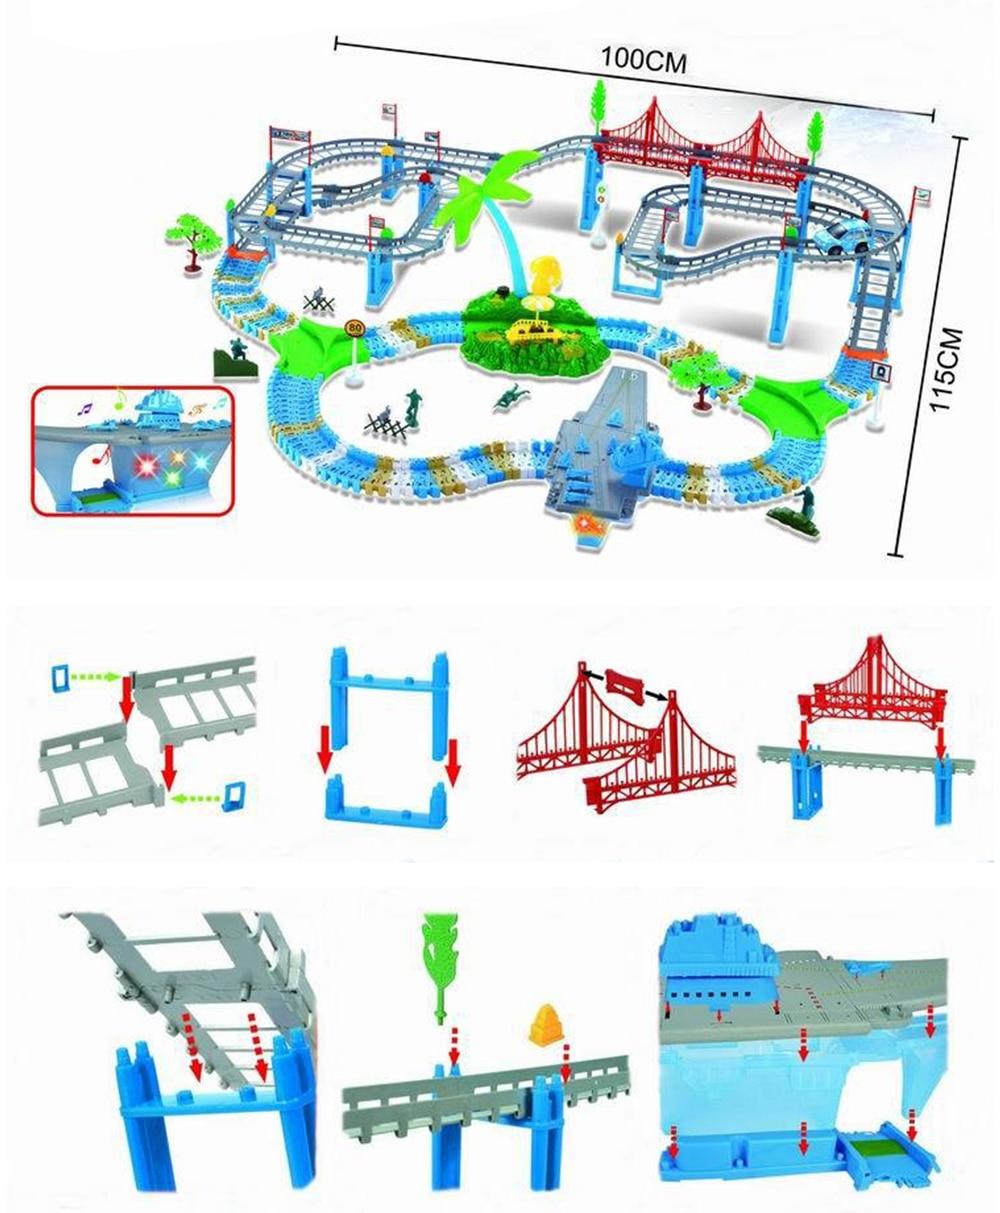 2018 New Electric Rail Car Toy Racing Car Orbit DIY Transportation Track Assemble Building Blocks Birthdays Gift Toy For Kids